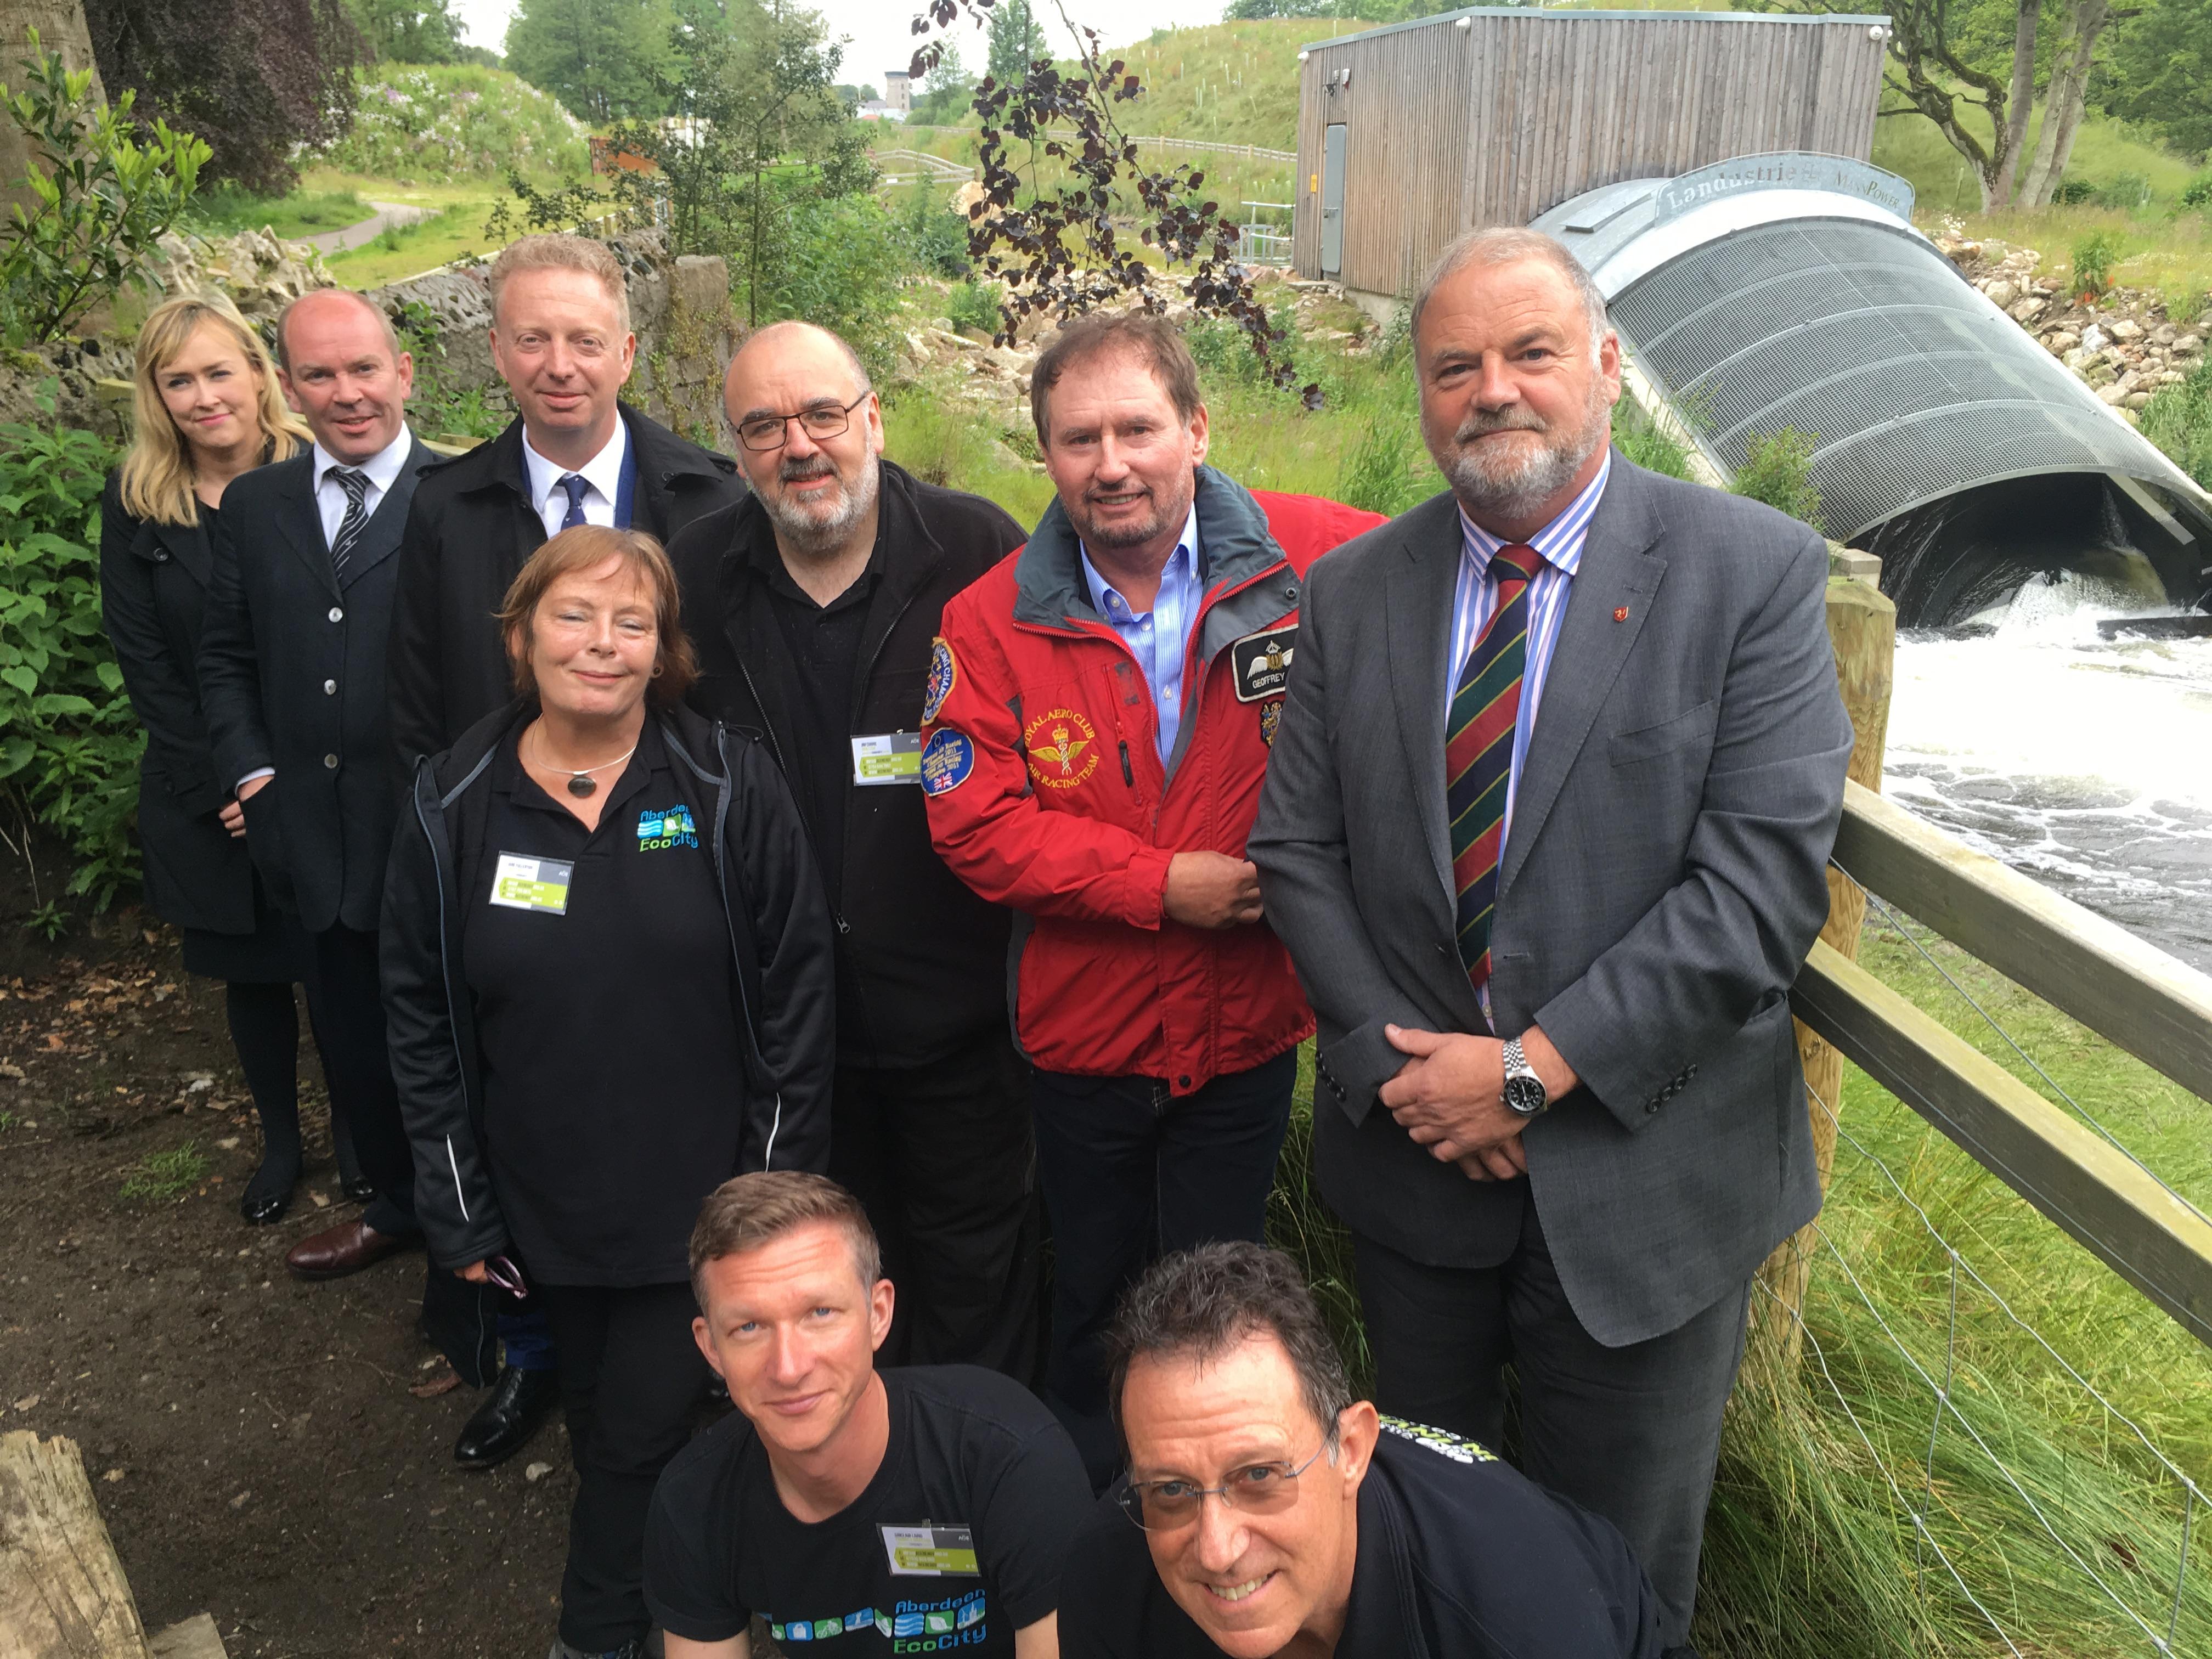 Delegates visited the hydro scheme near Donside village